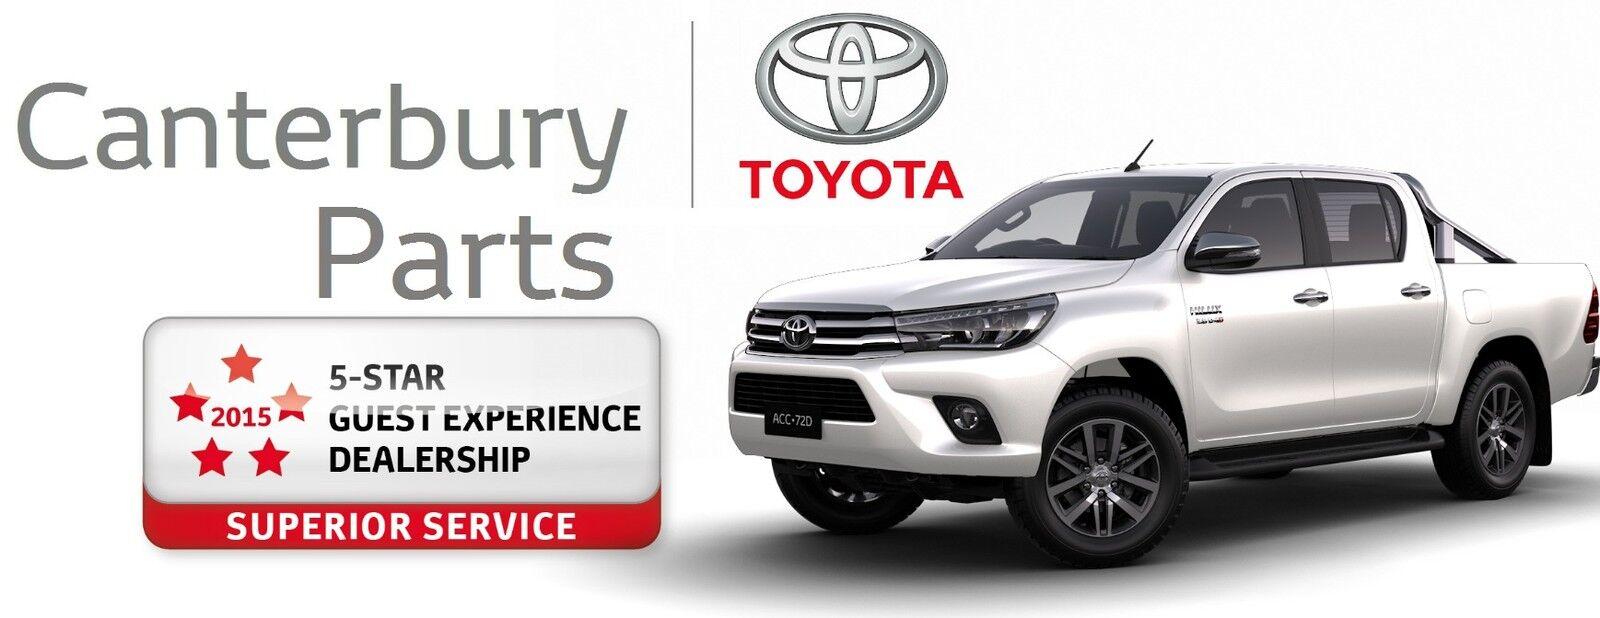 Canterbury_Toyota